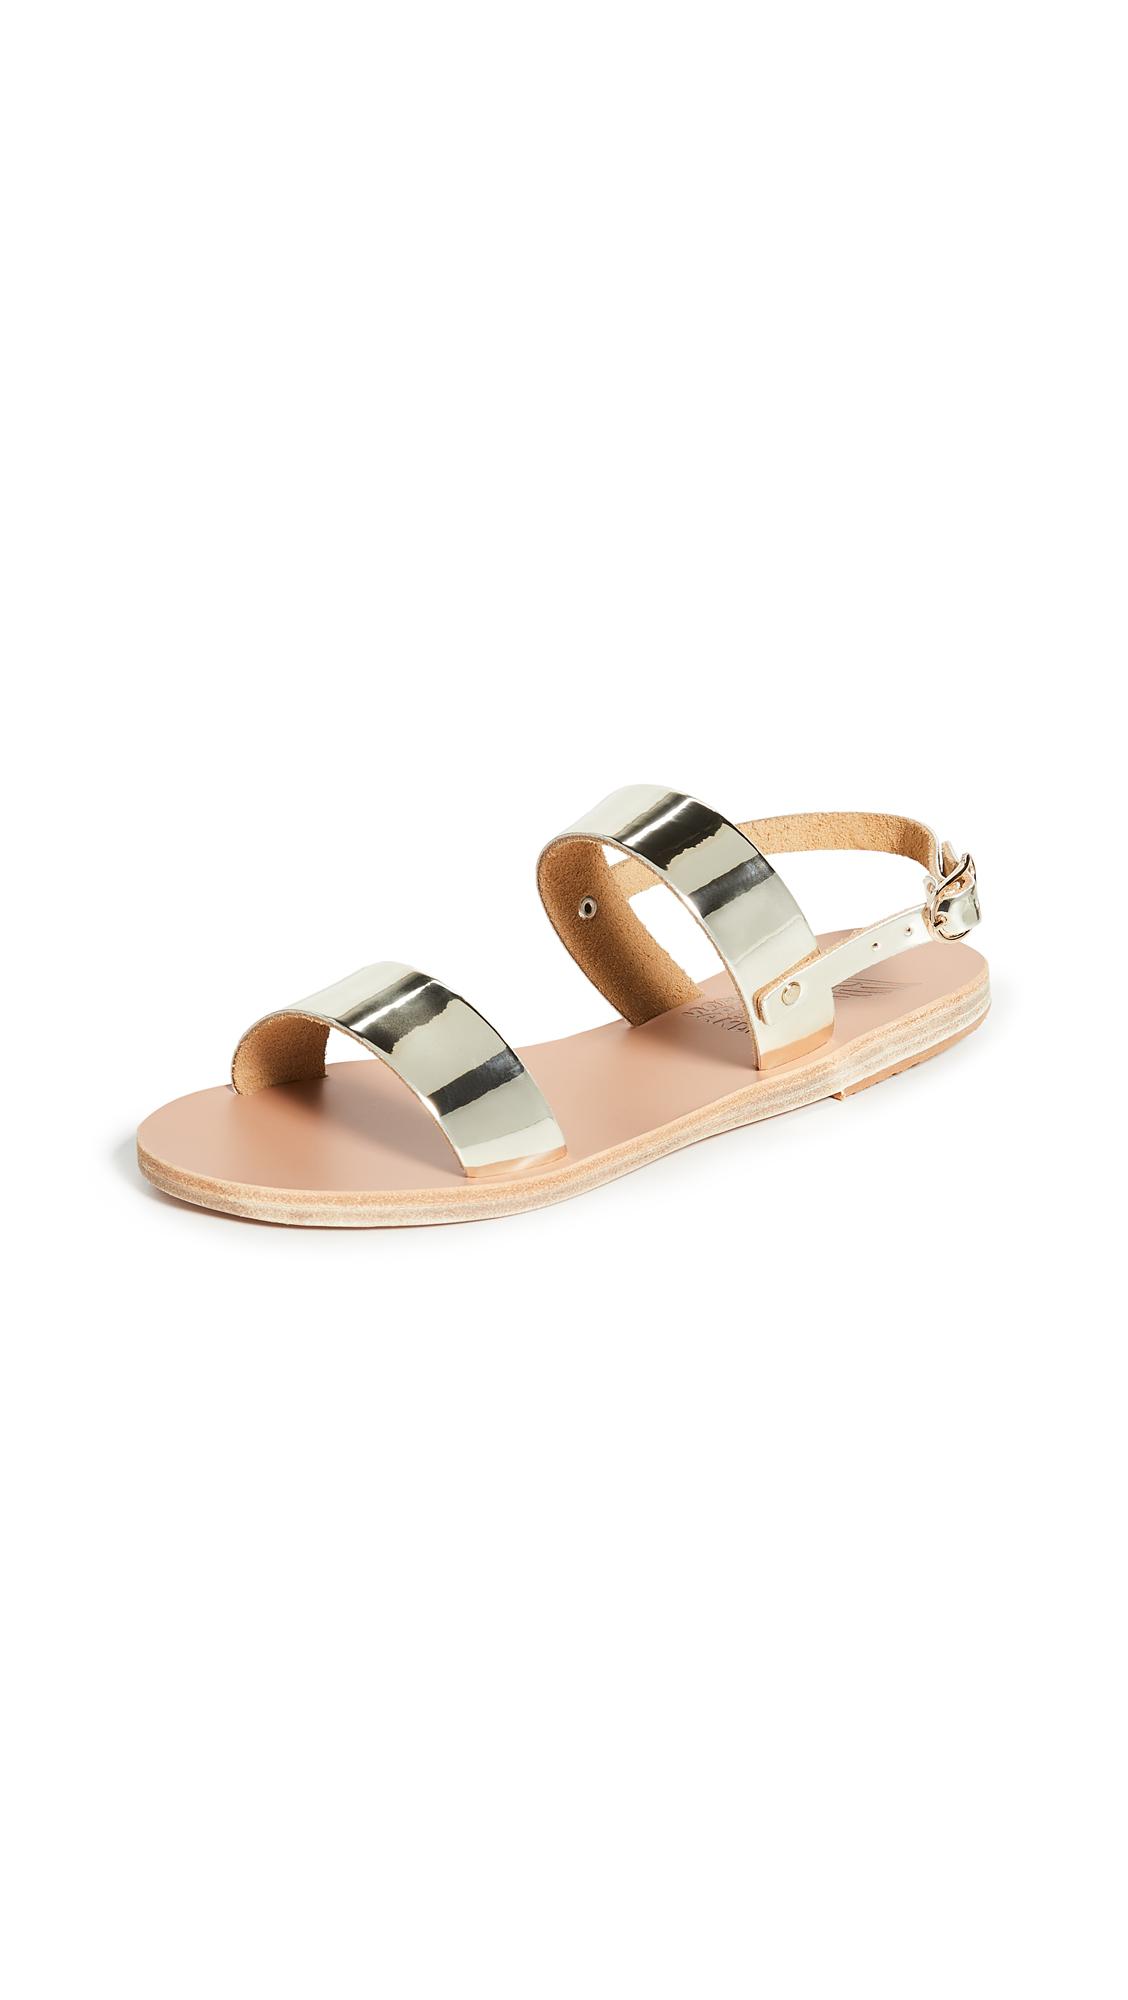 Buy Ancient Greek Sandals Clio Sandals online, shop Ancient Greek Sandals